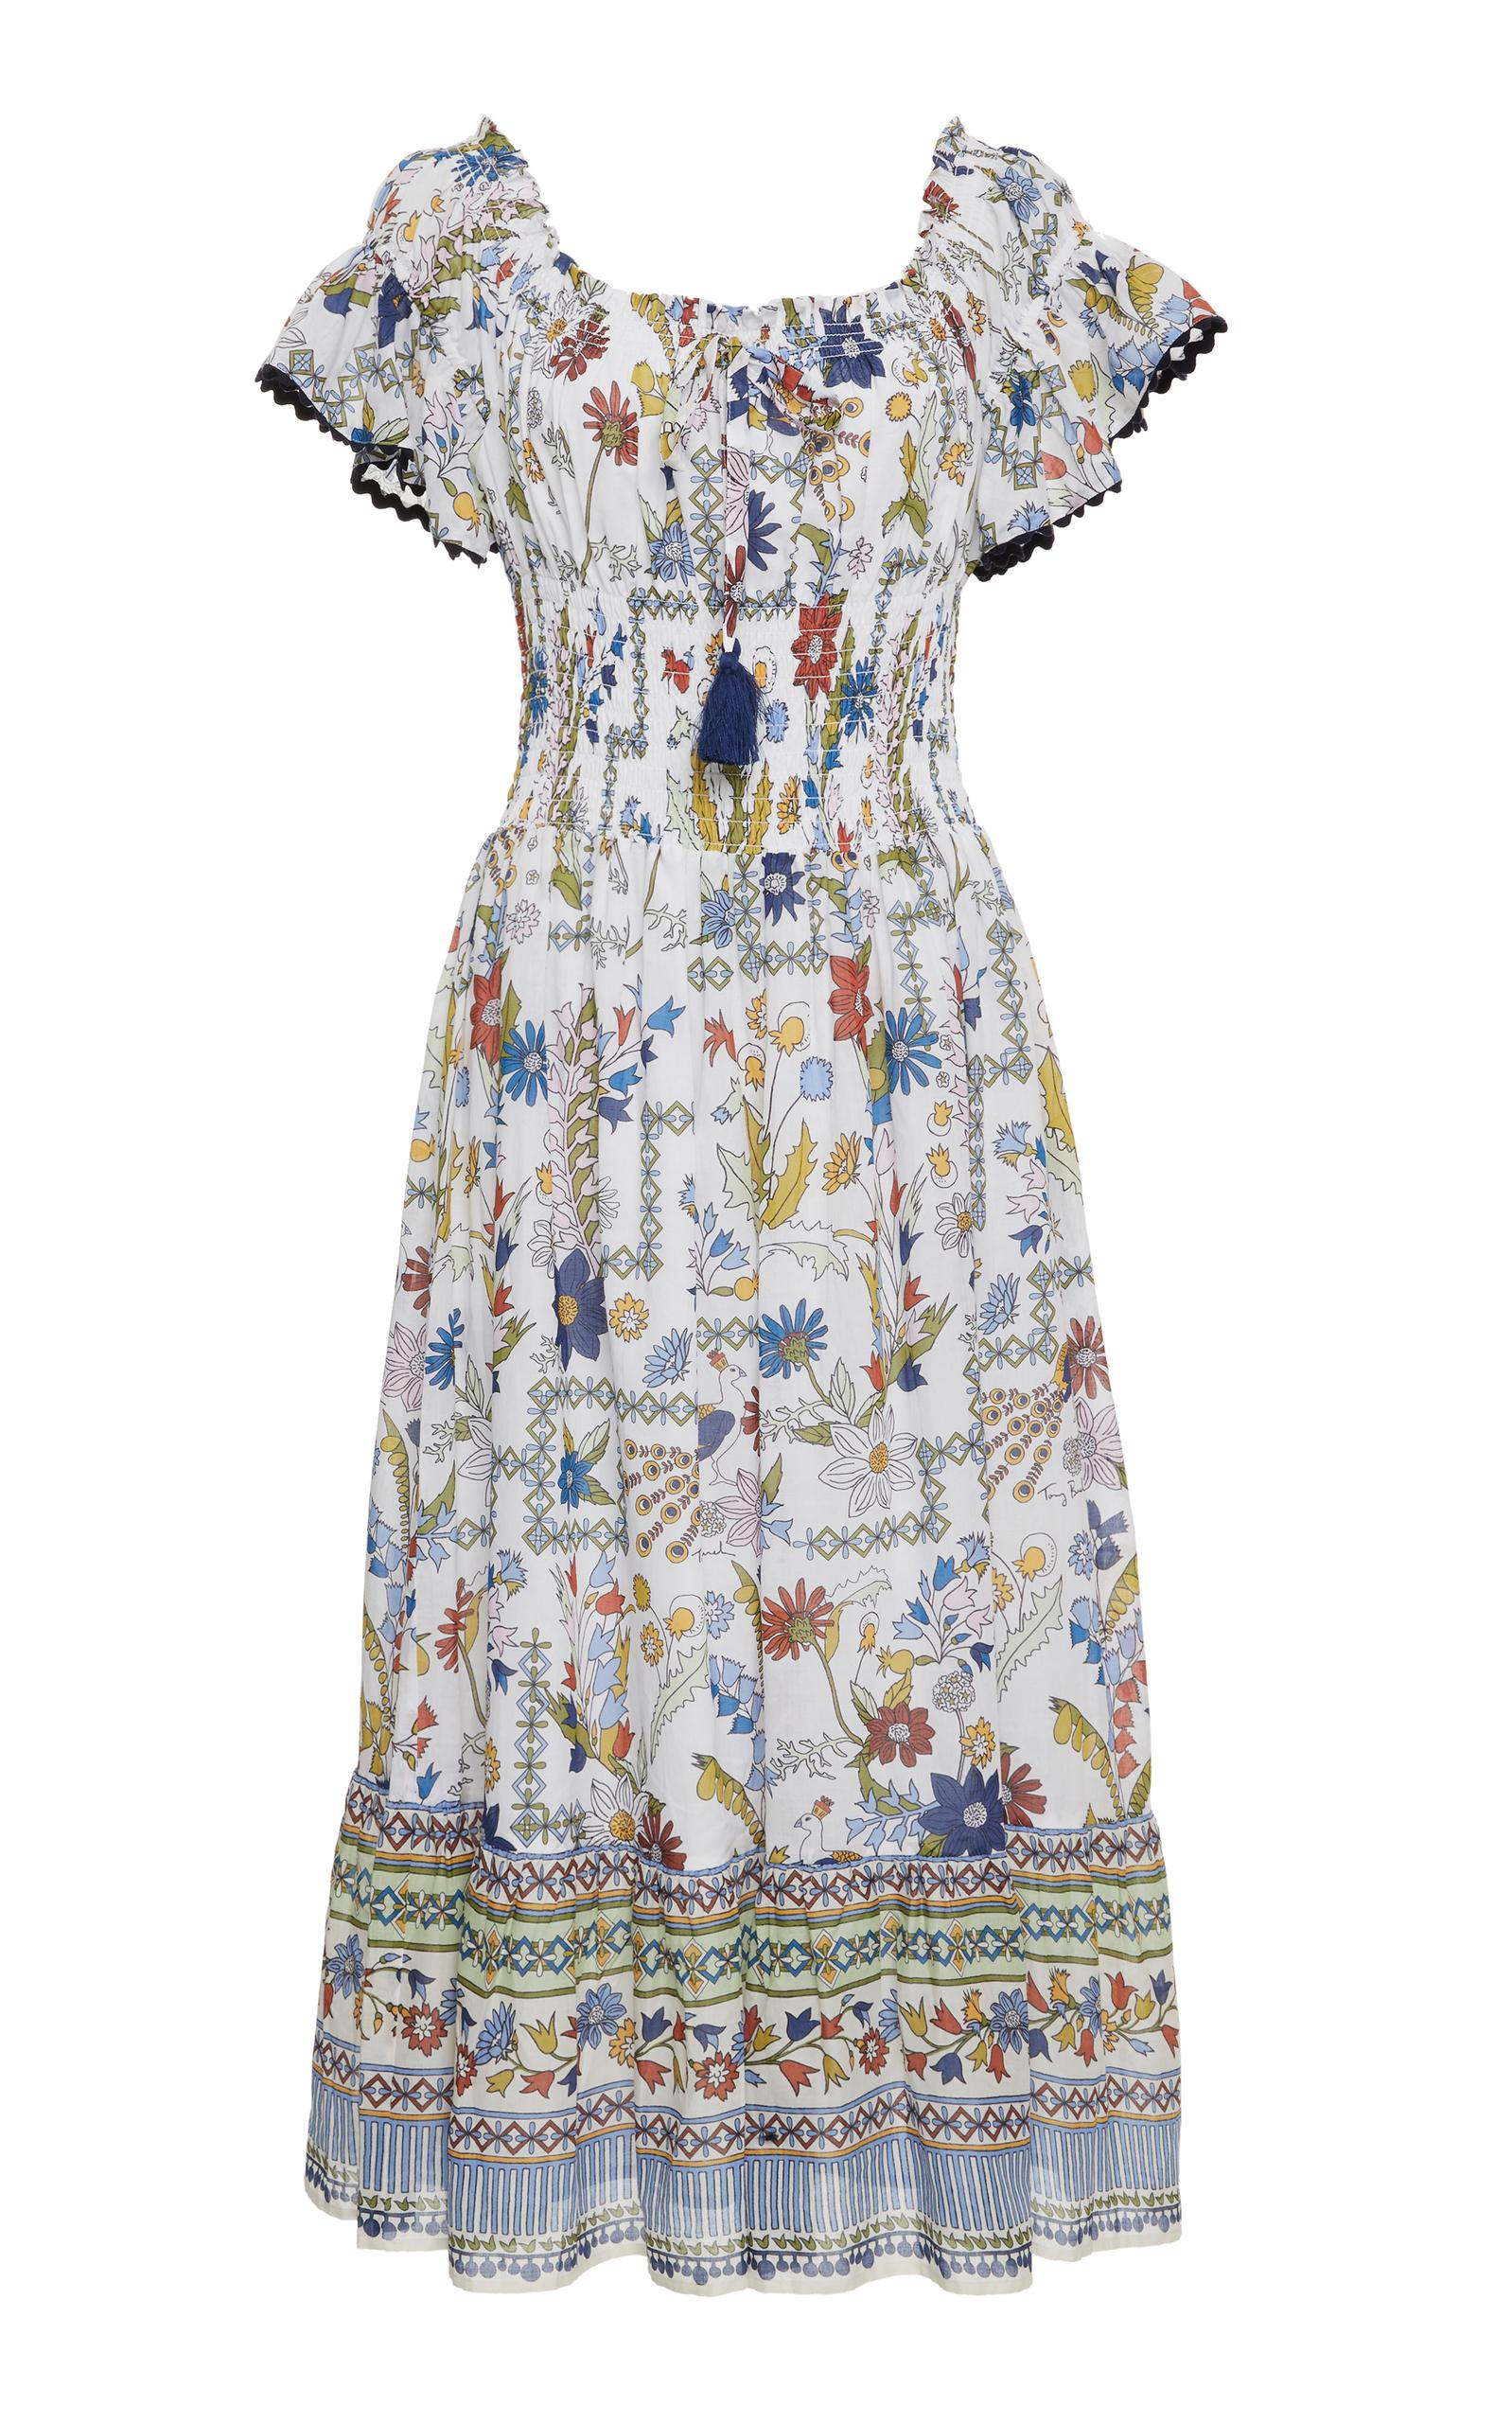 8413c06e2c Tory Burch Meadow Folly Floral Dress | ModeSens